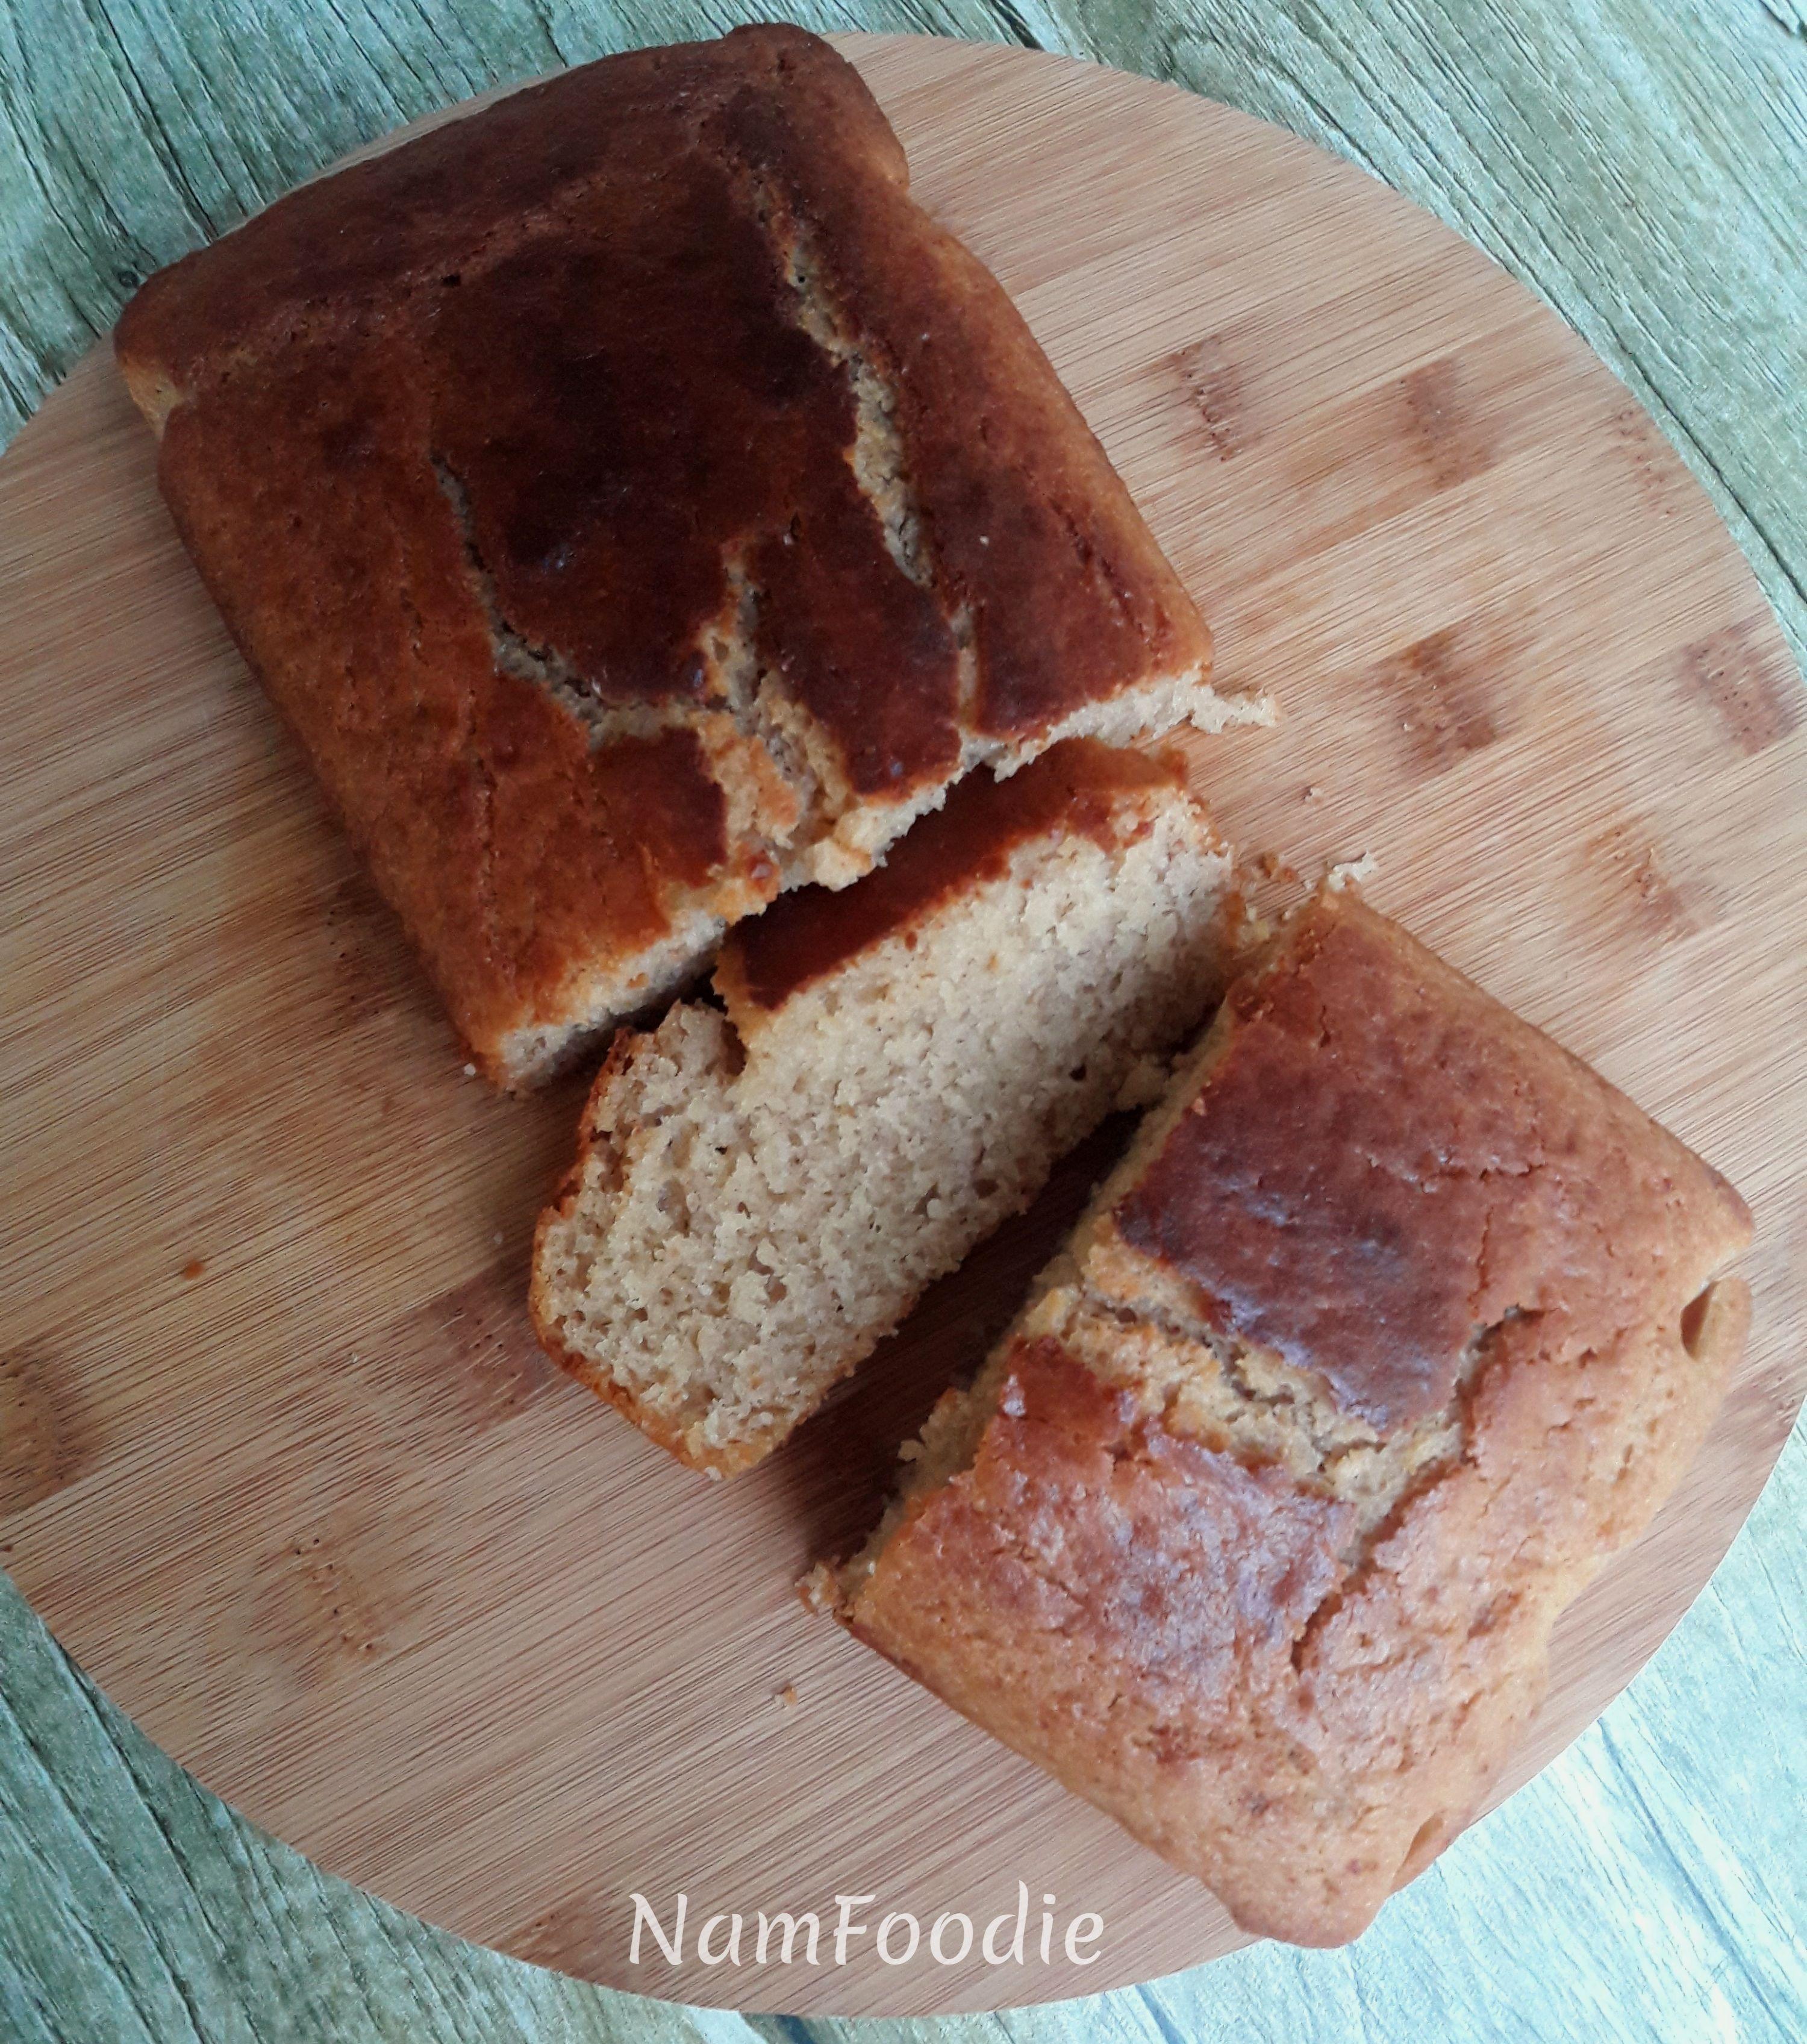 Peanut butter banna bread